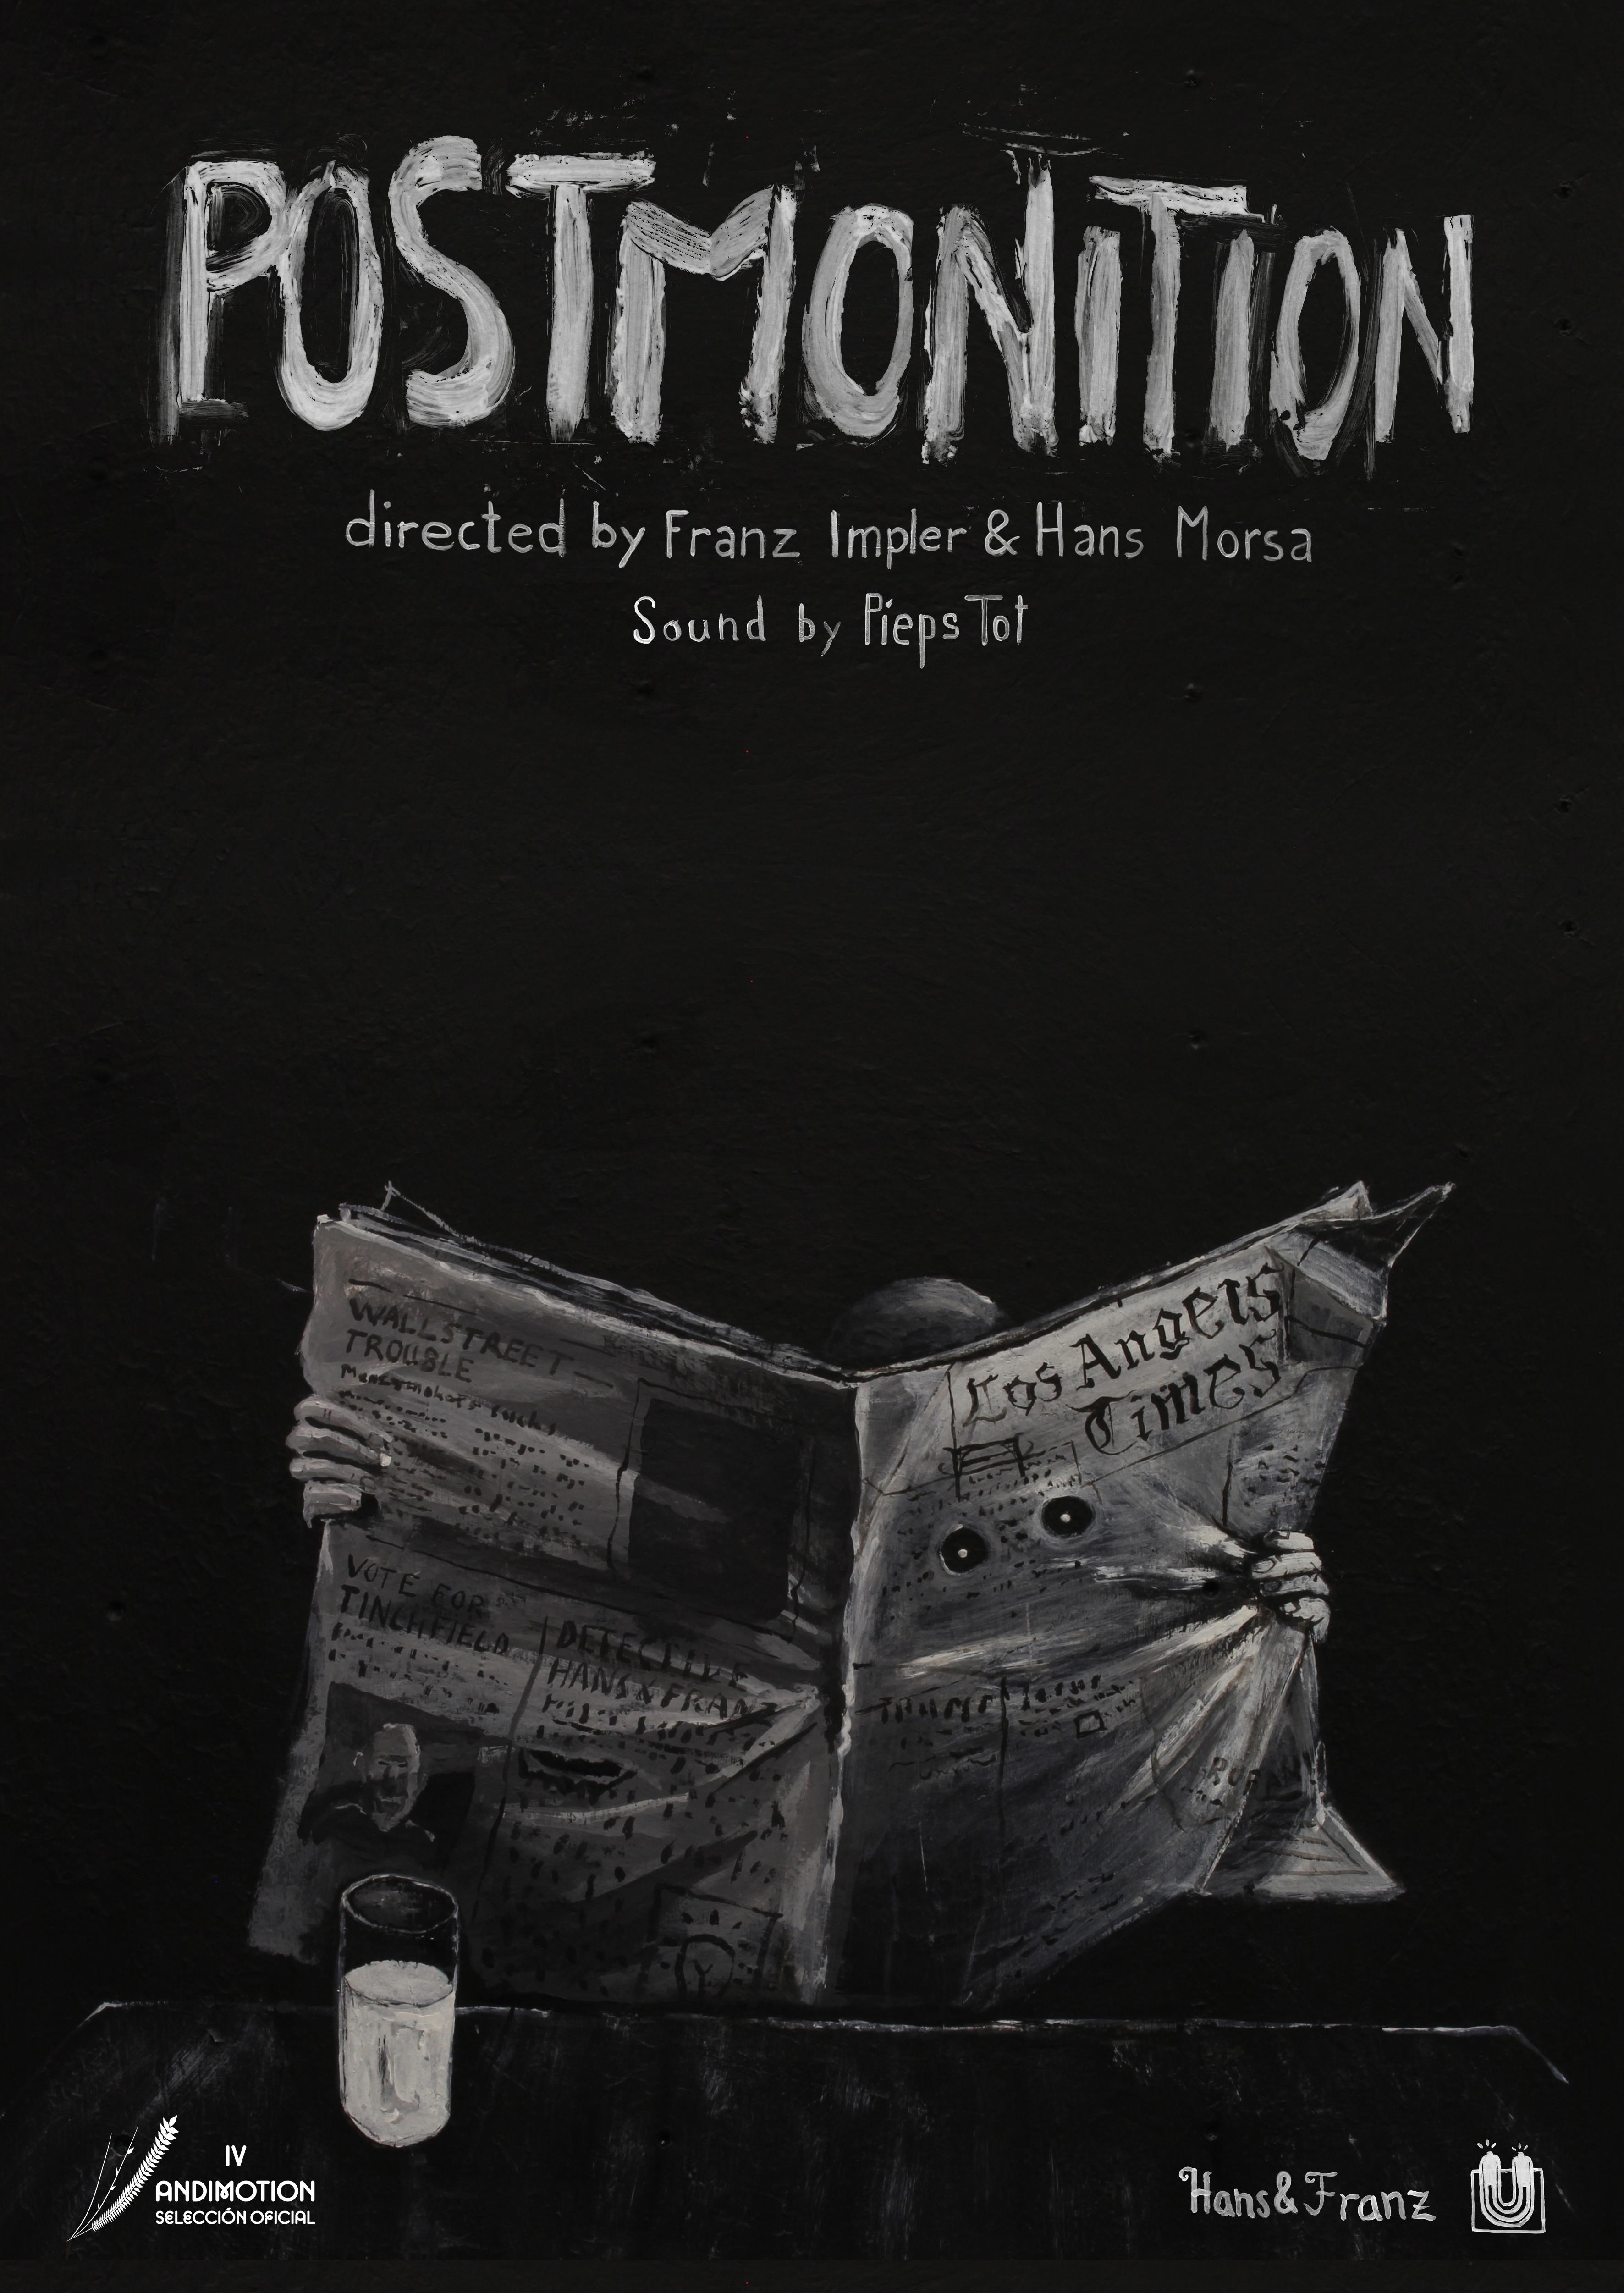 Postmonition